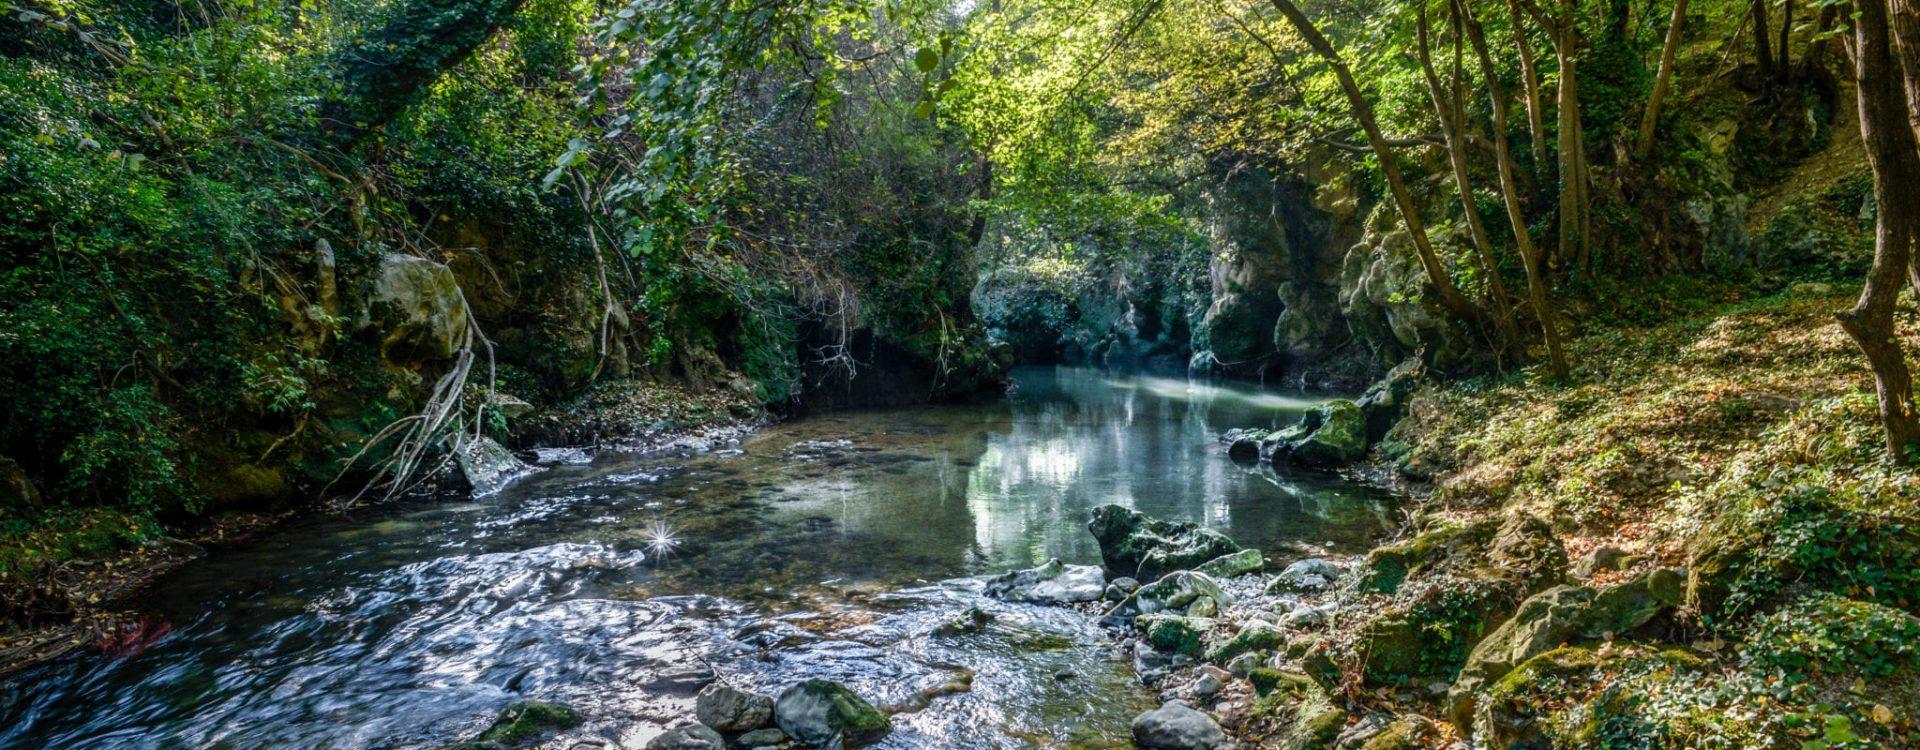 _fiume 2